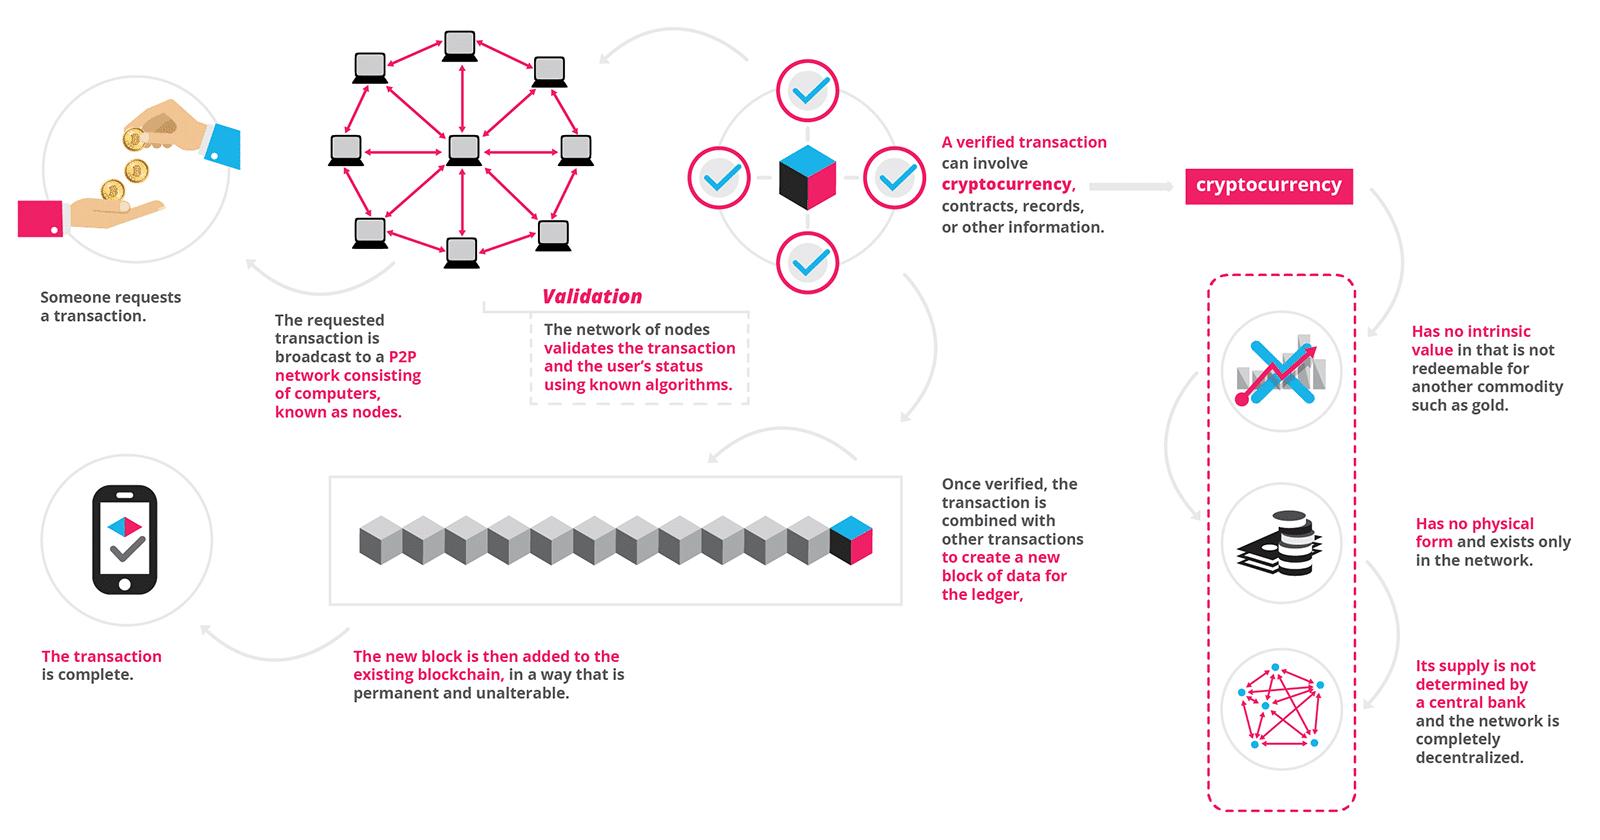 The blockchain mechanism